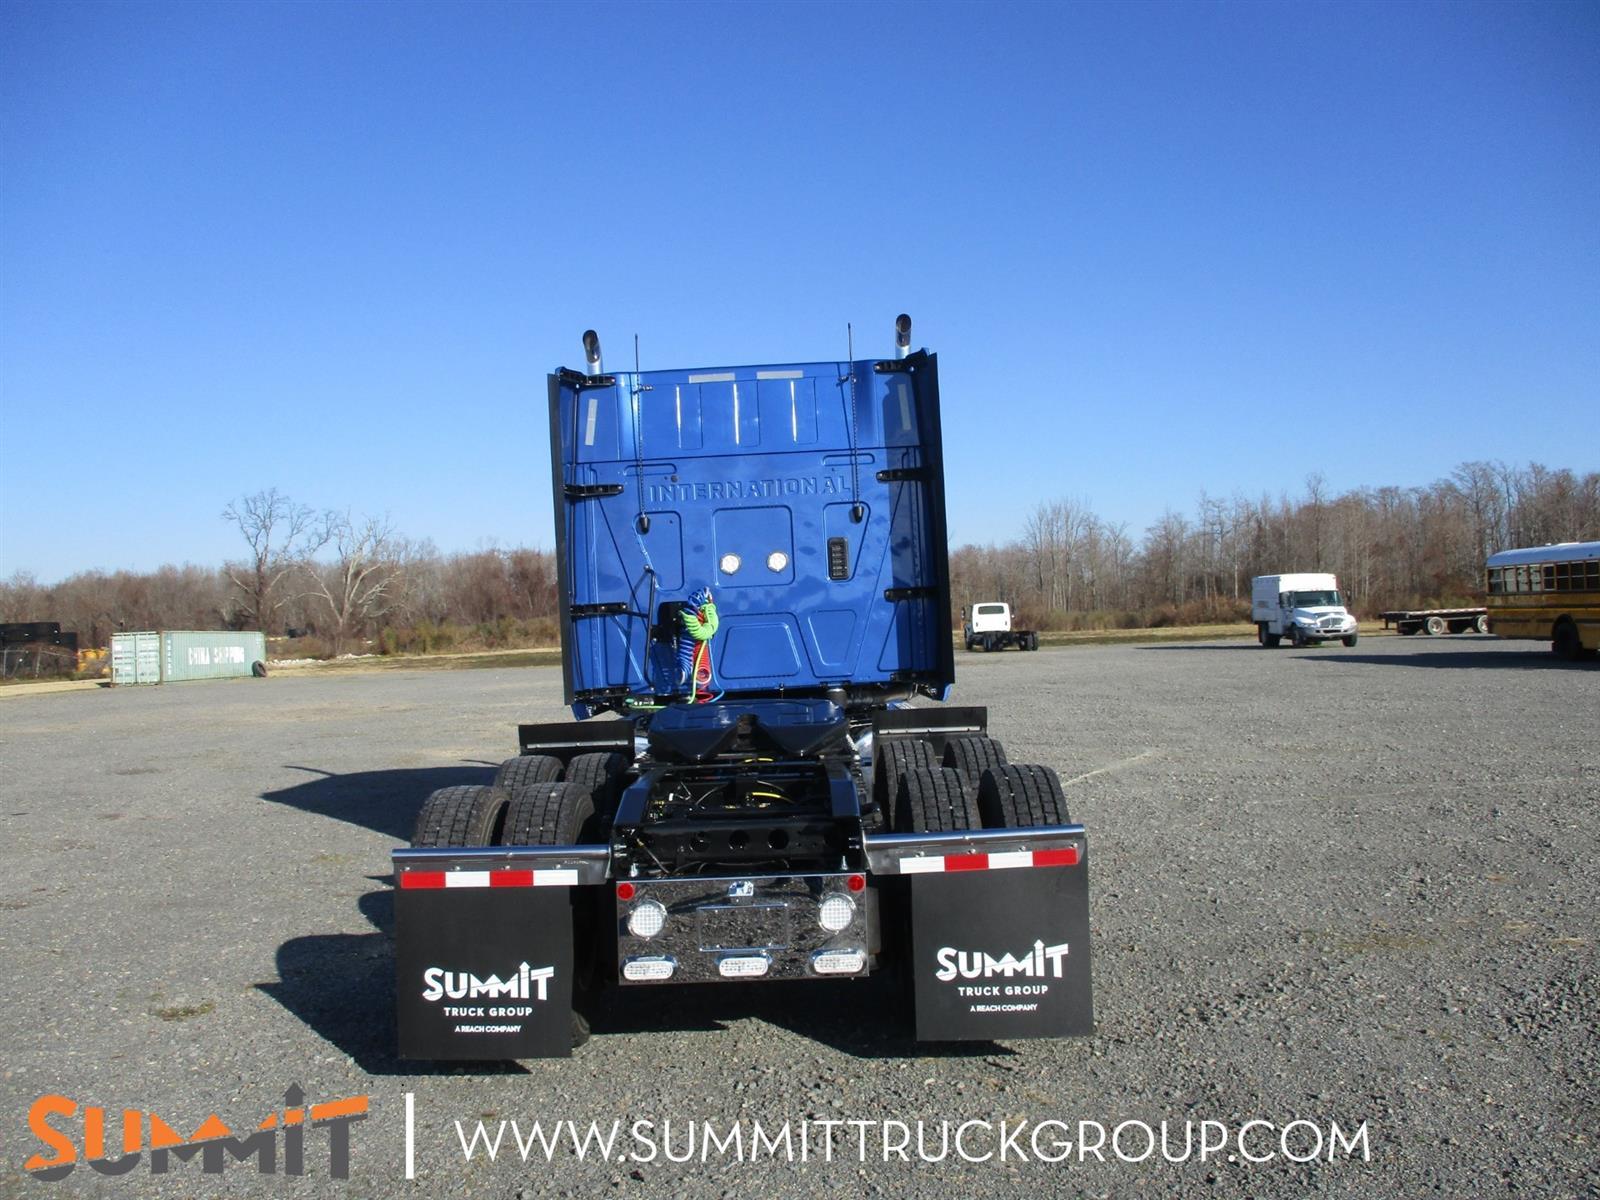 2021 International LoneStar Sleeper Cab 6x4, Tractor #MN442045 - photo 1